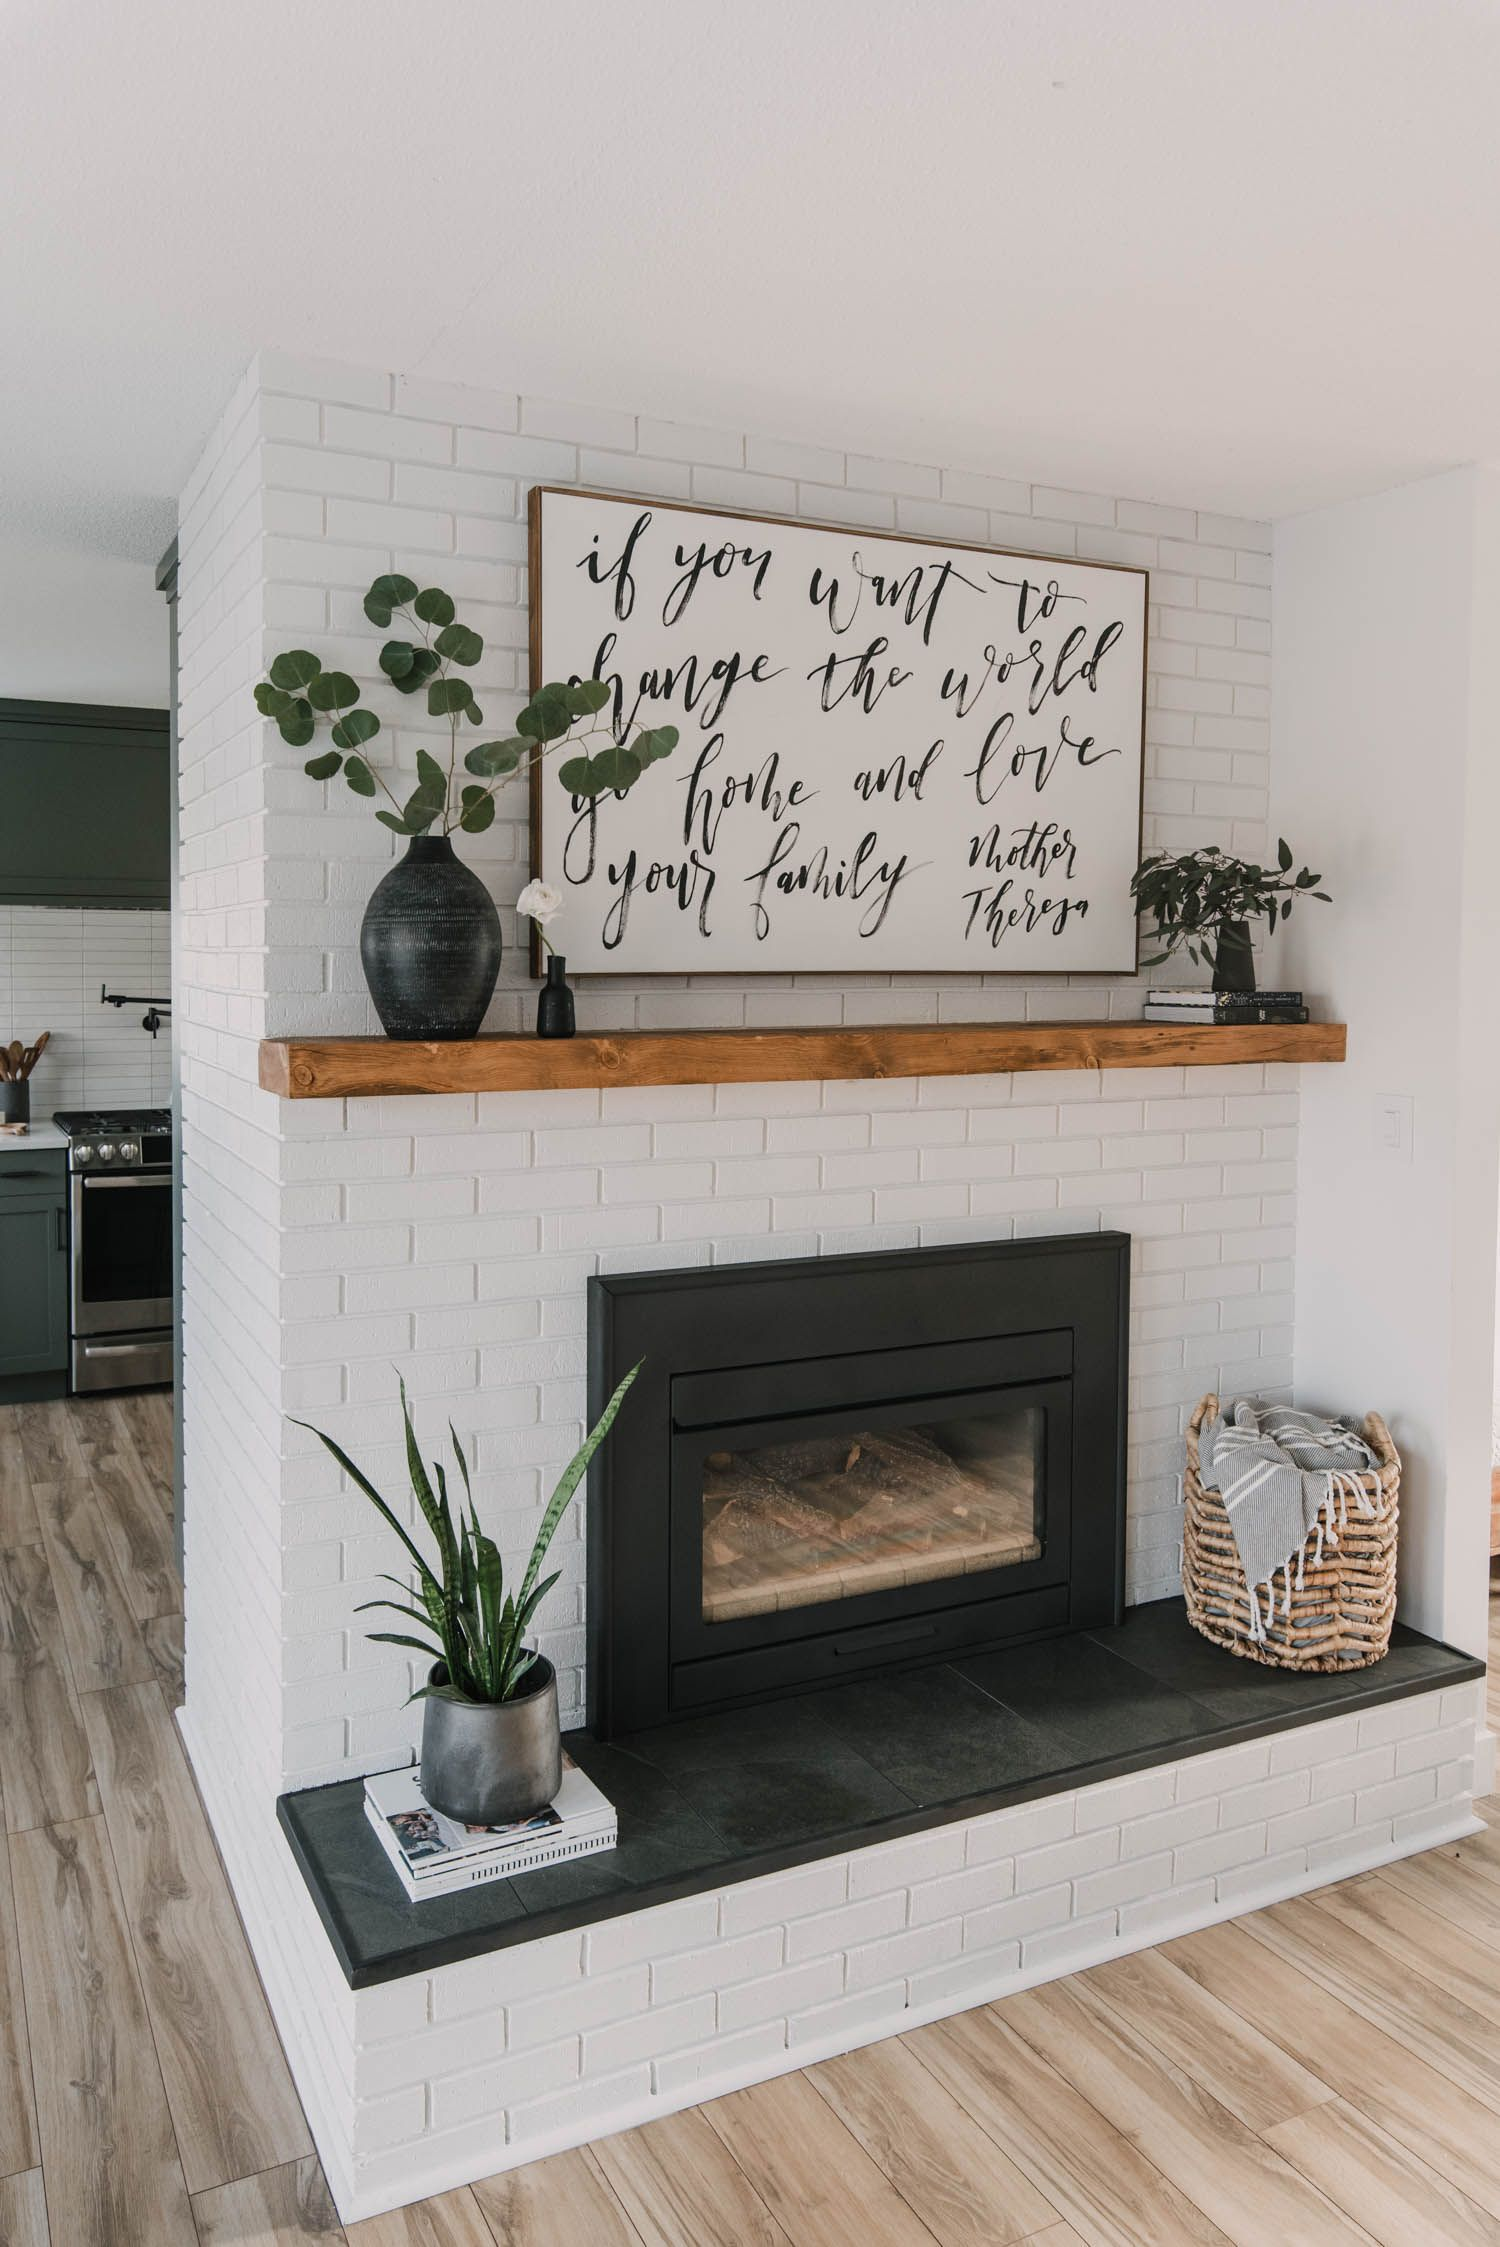 Diy Brick Fireplace Makeover In 2020 Diy Fireplace Makeover Diy